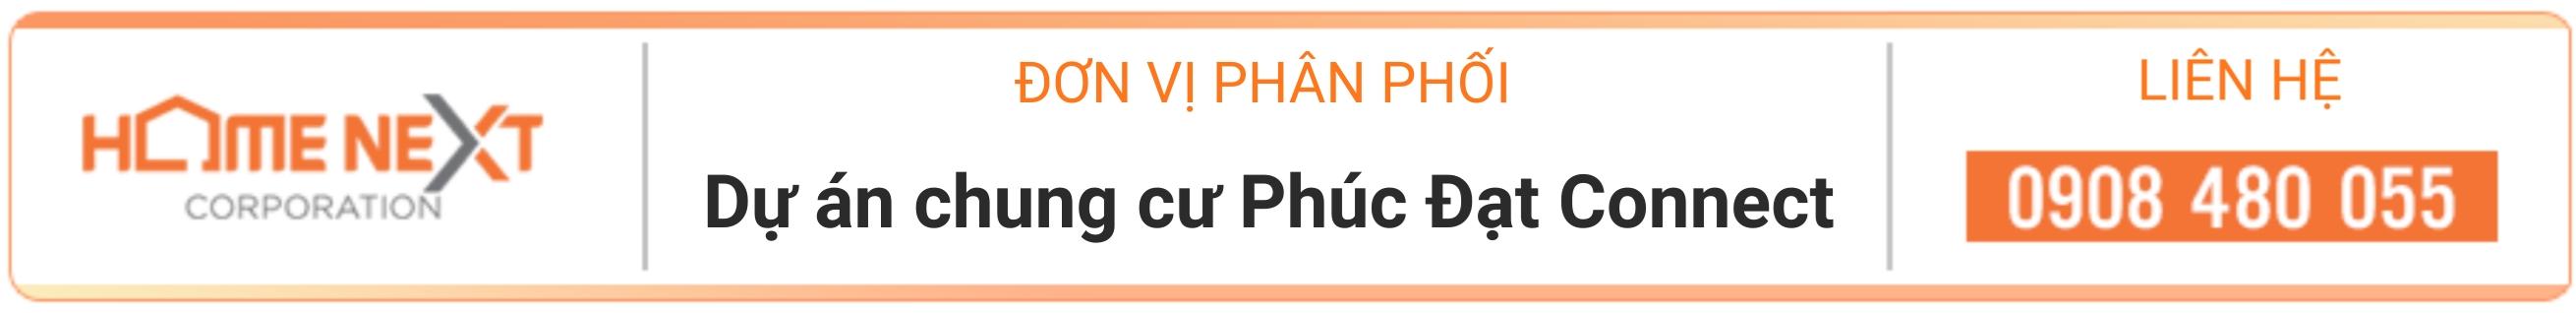 banner-don-vi-phan-phoi